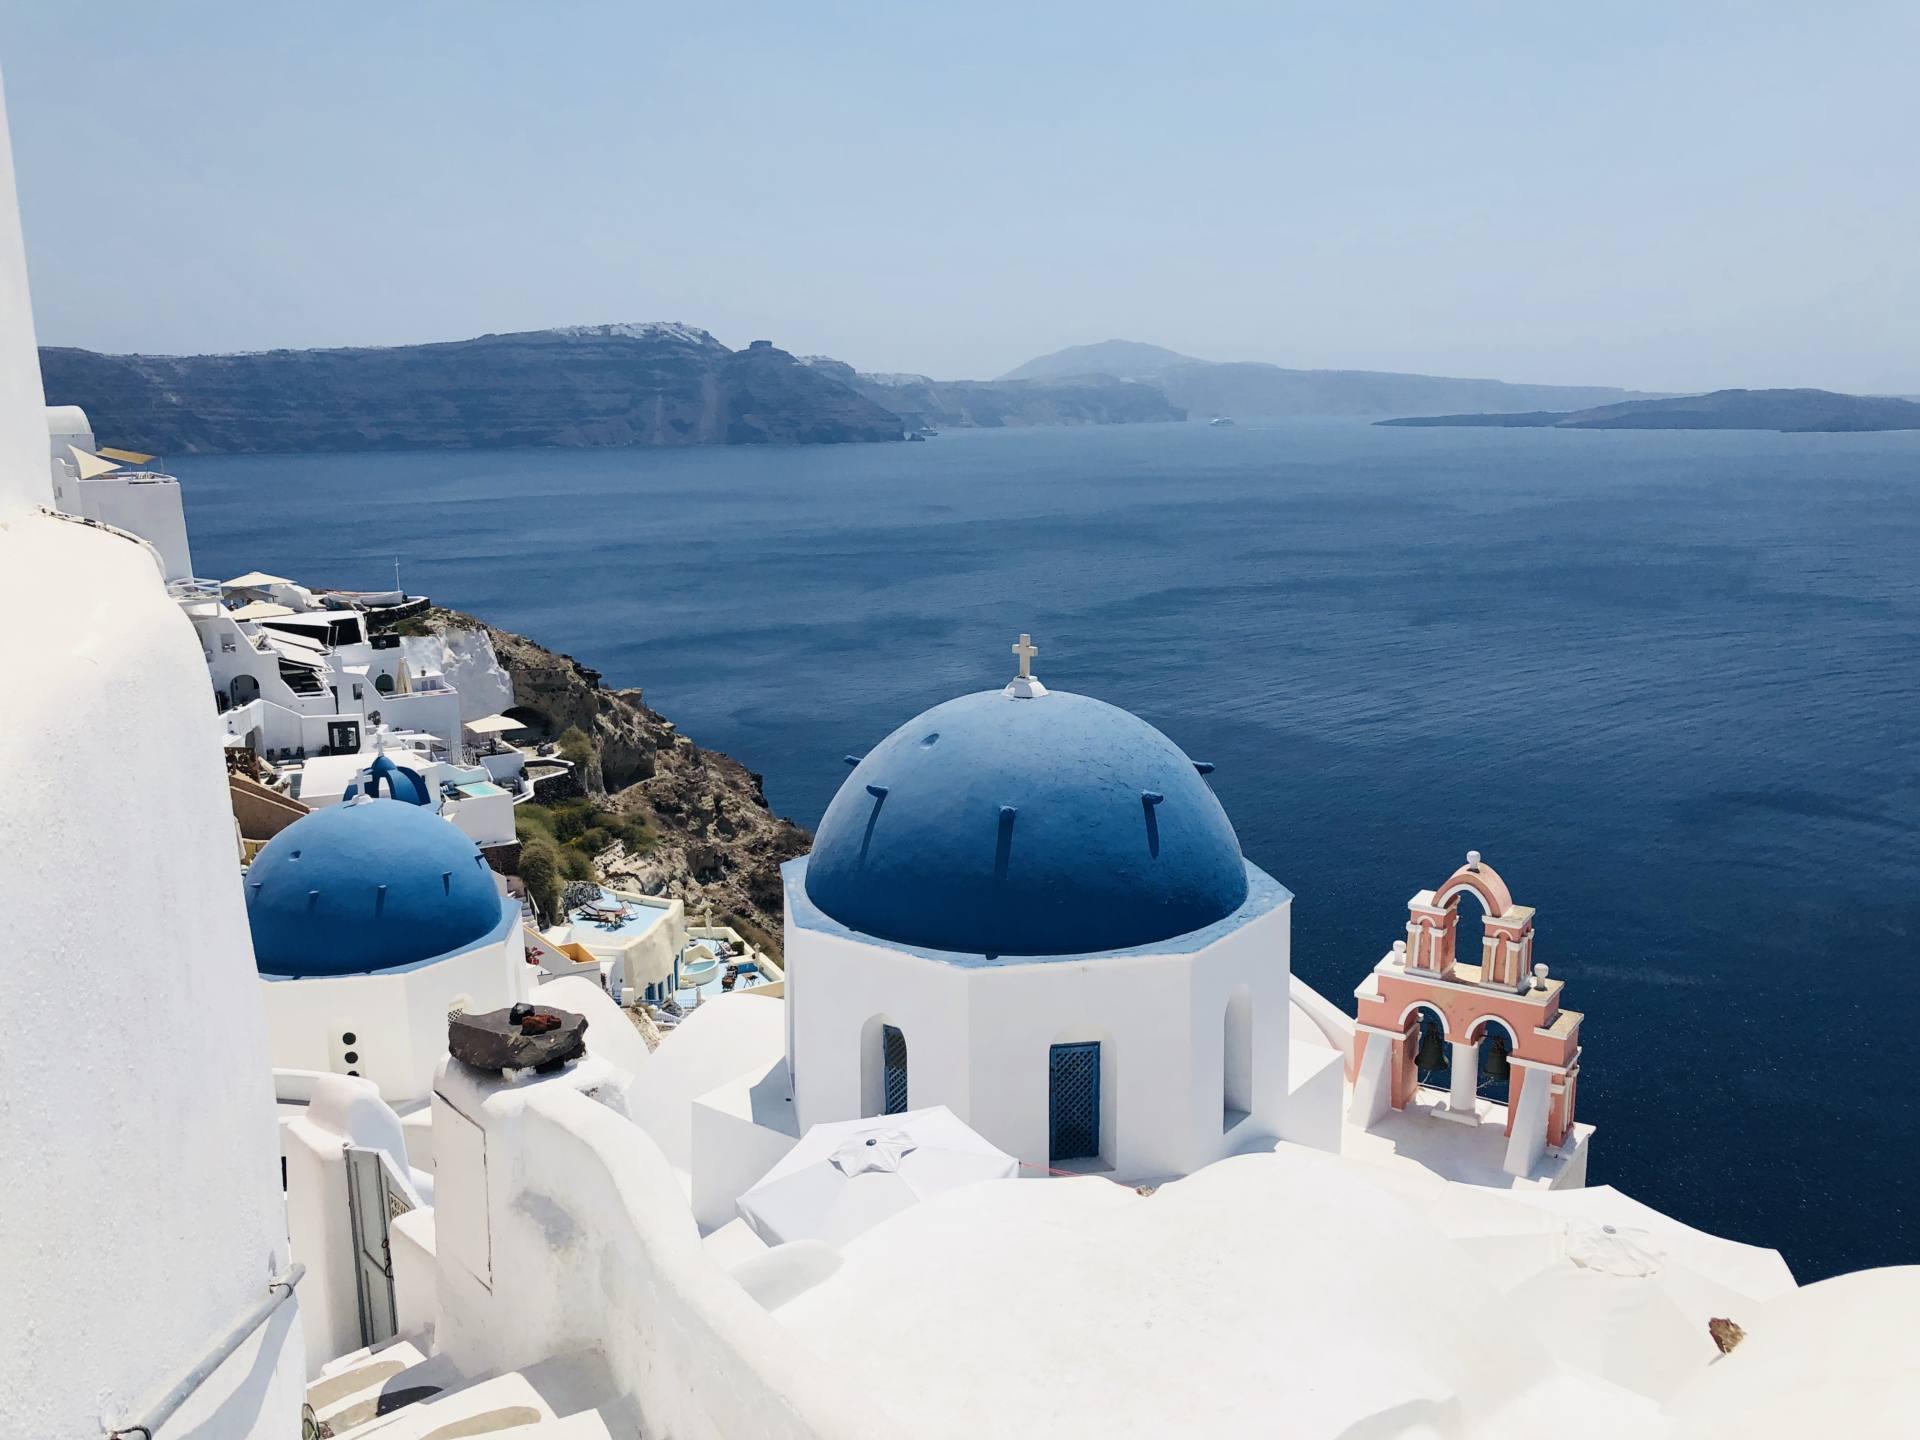 Grèce cyclades santorin